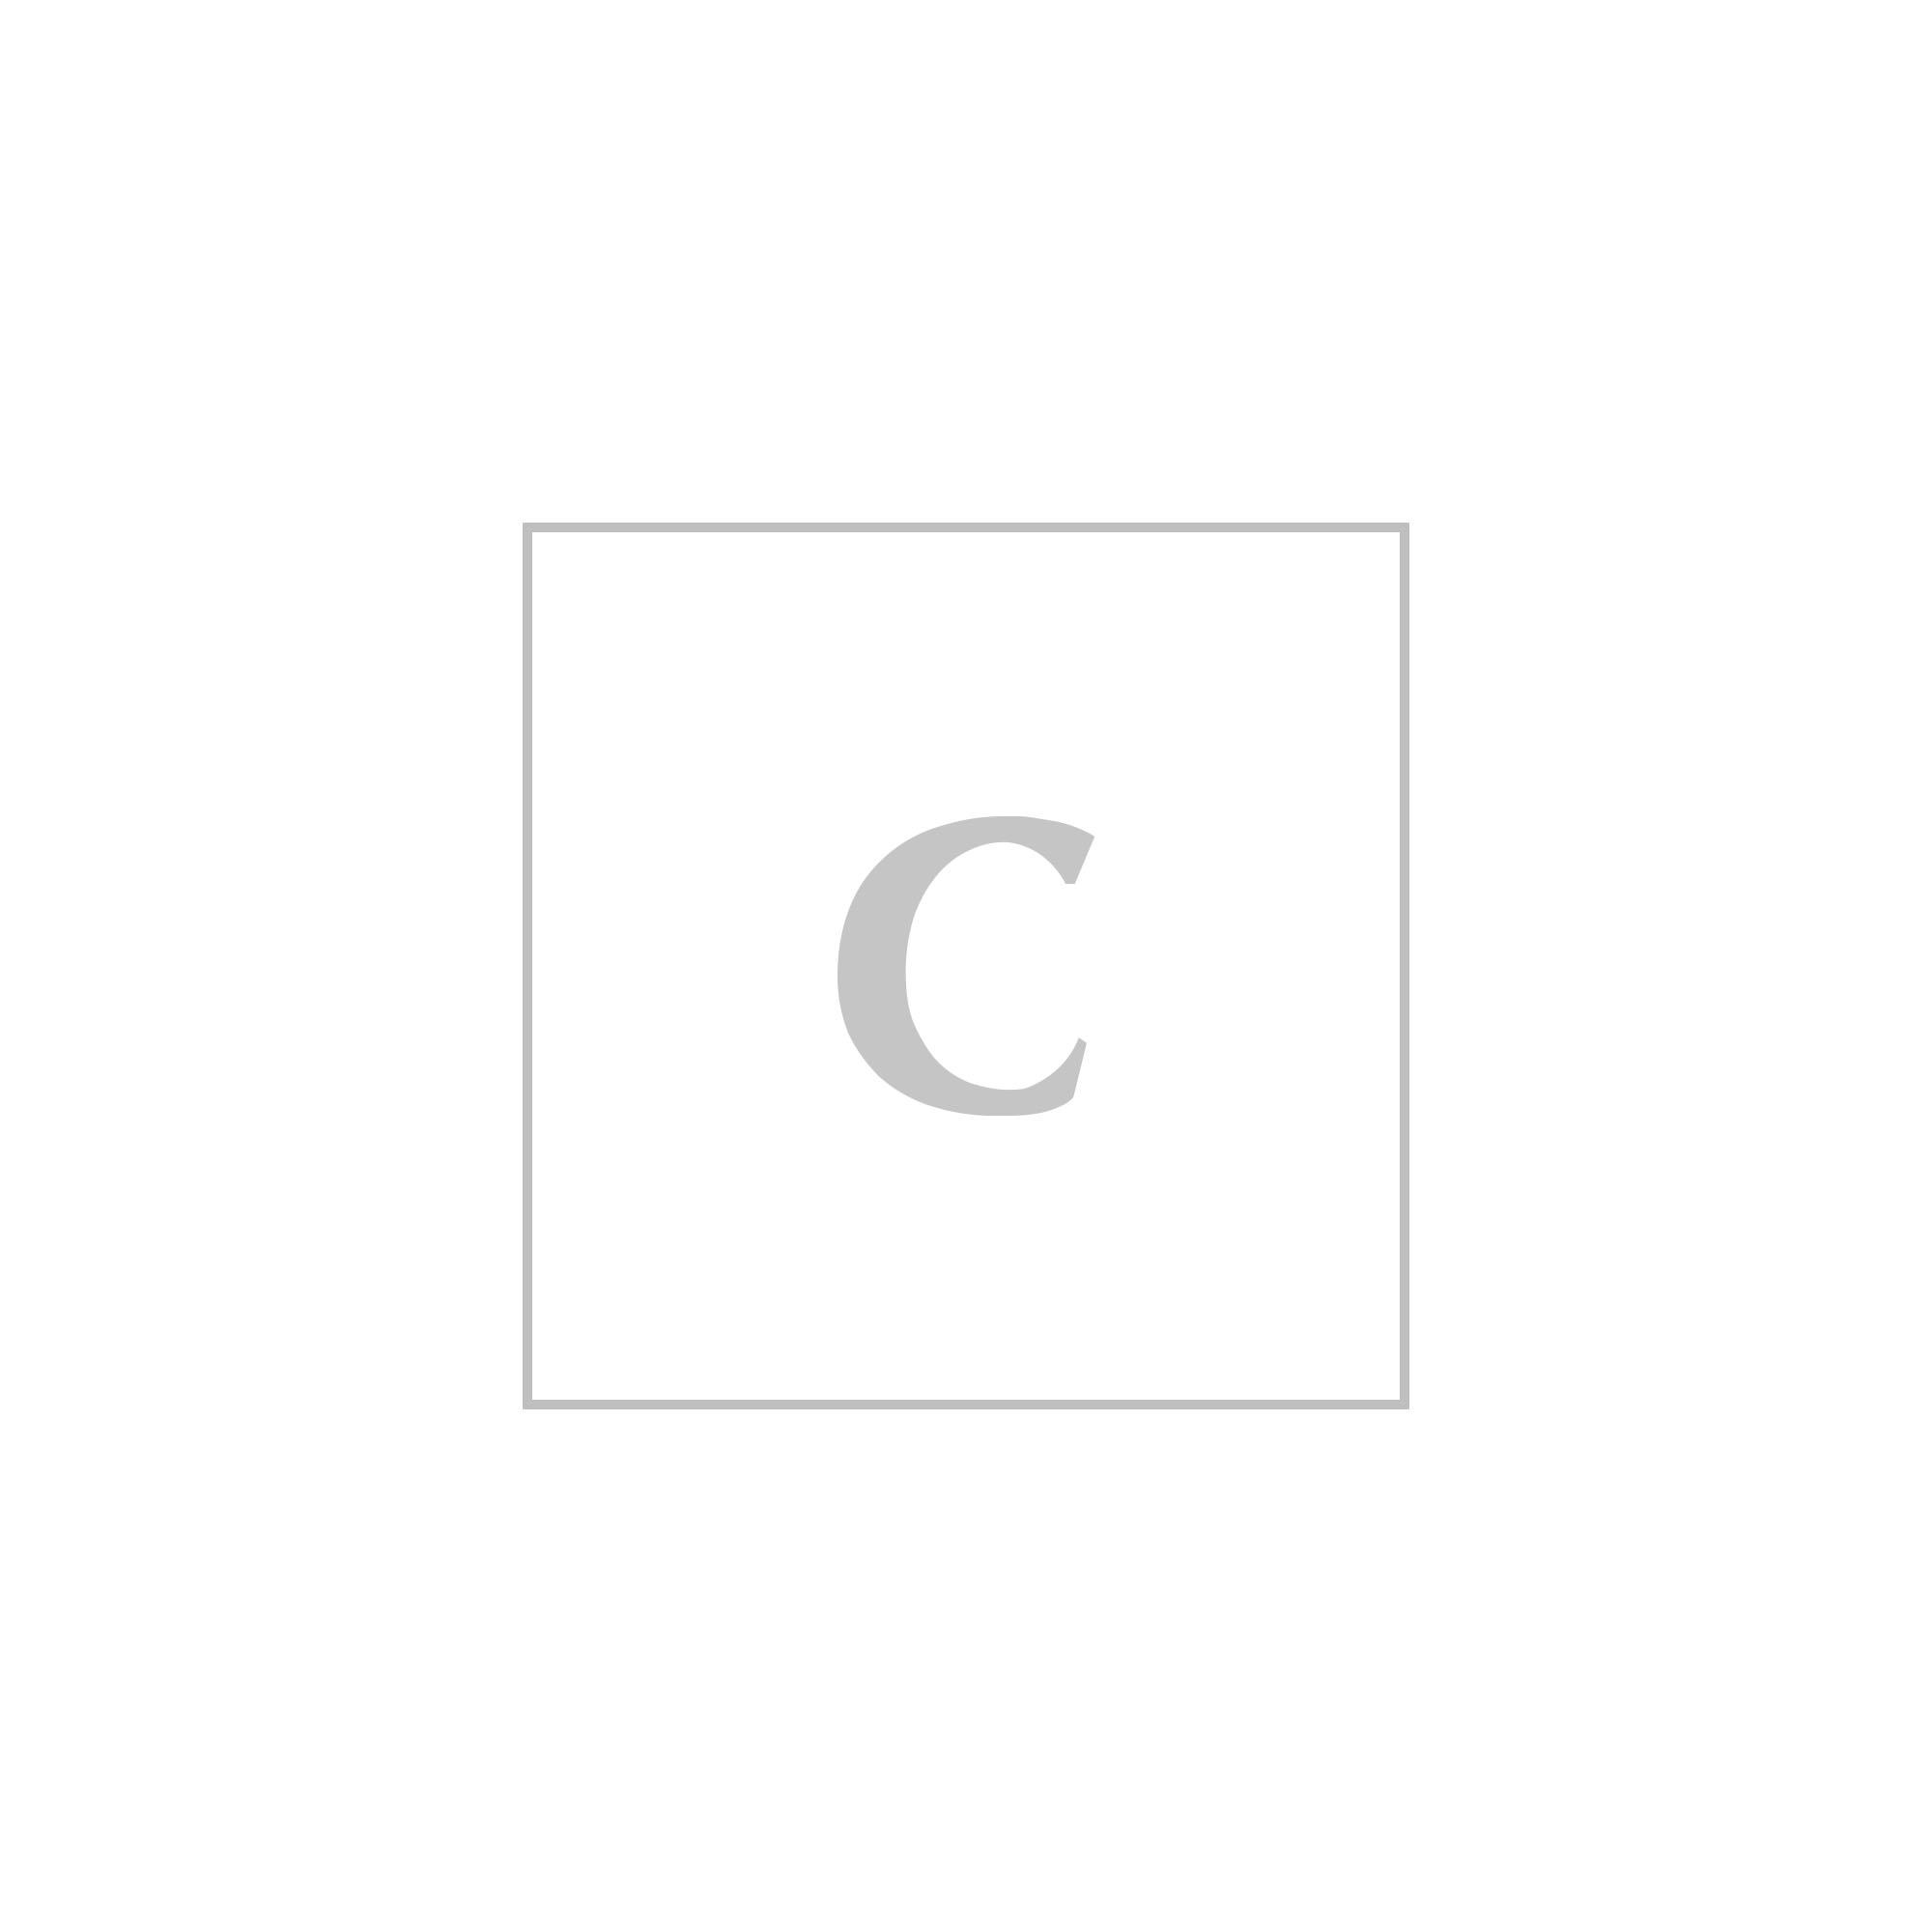 Saint laurent small cabas monogram bag